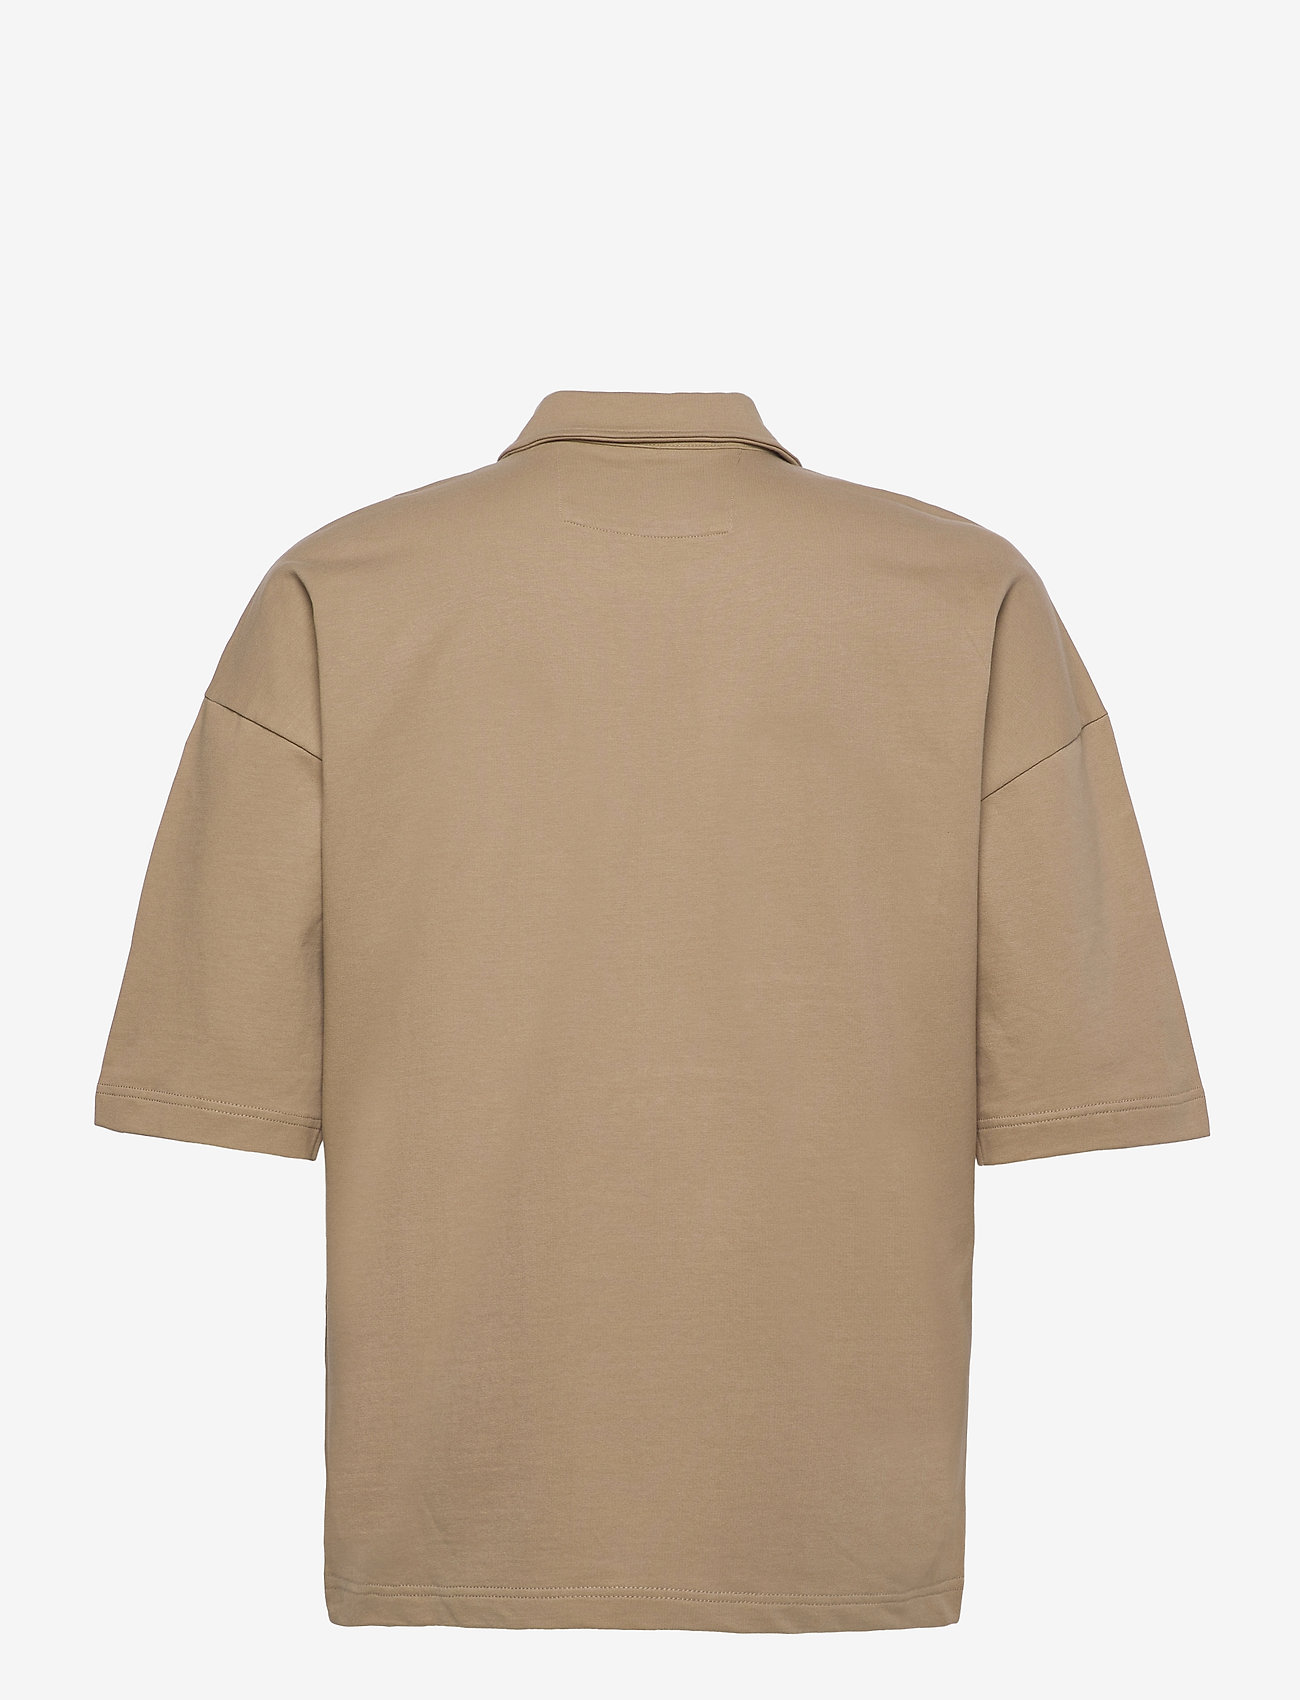 ONLY & SONS - ONSLEE  OVZ UTILITY ZIP SS SWEAT - koszule lniane - chinchilla - 1